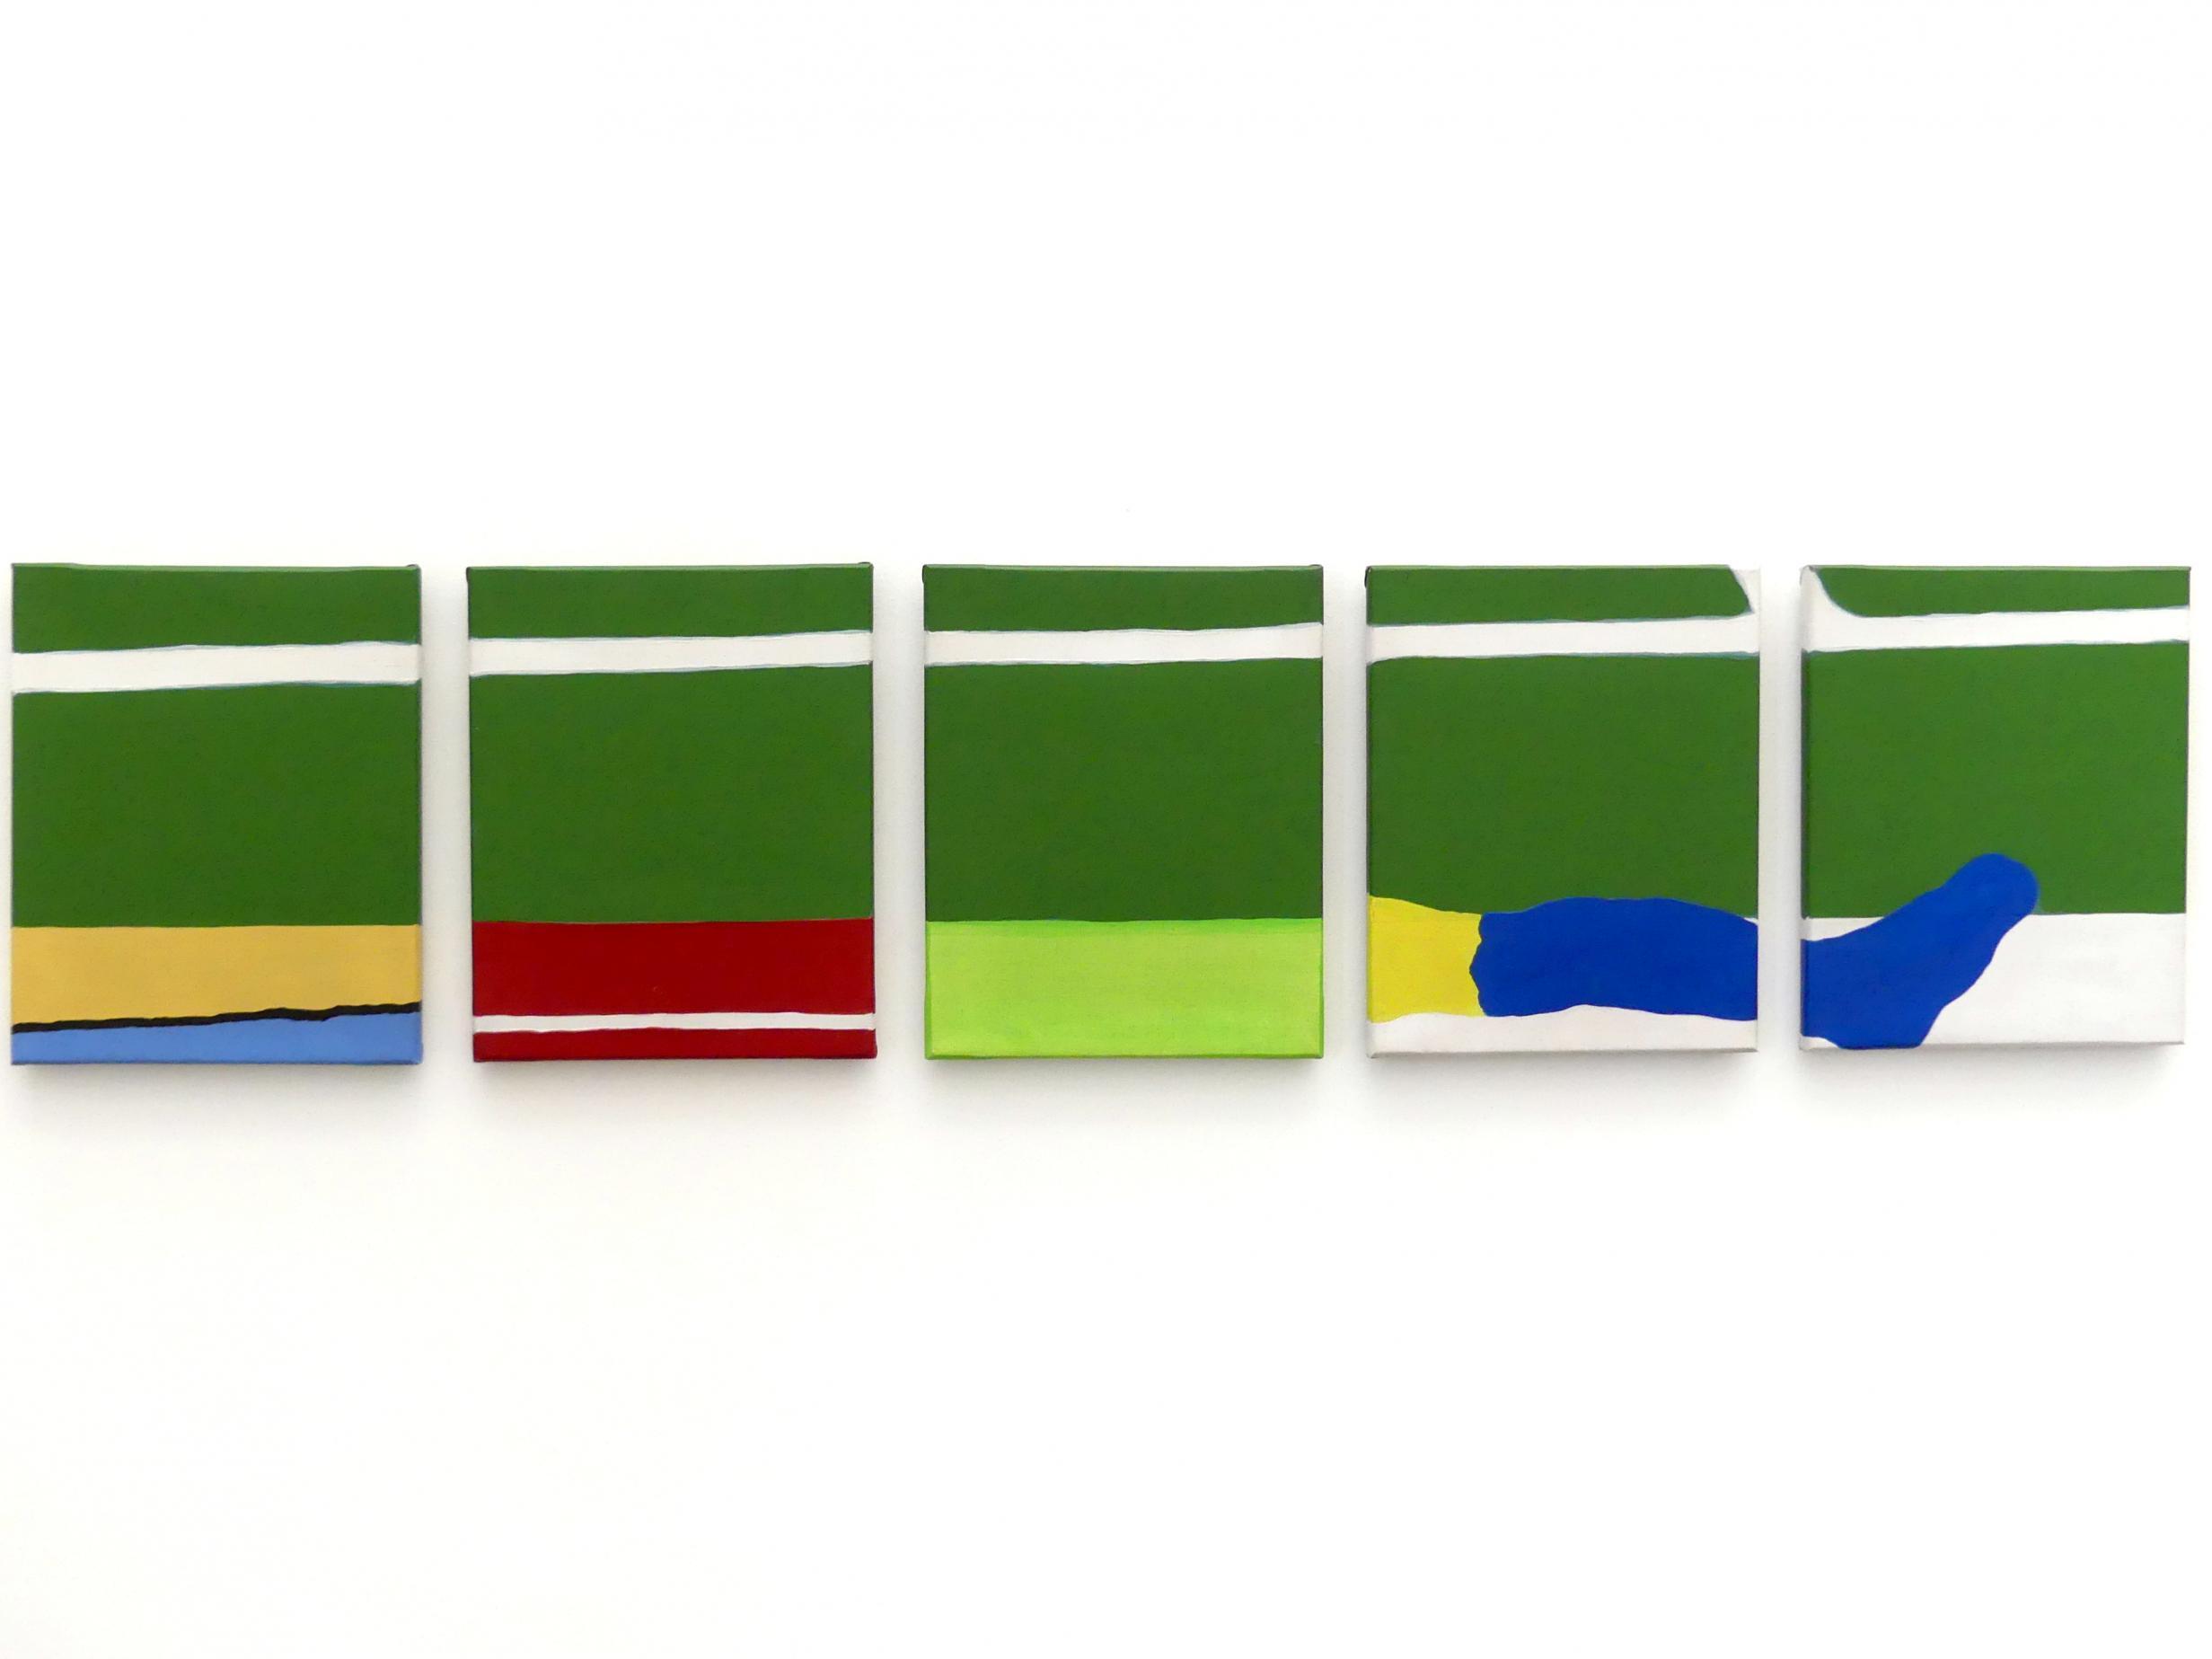 Raoul De Keyser: Onderbroken kalklijn - Unterbrochene Kalklinie, 1970